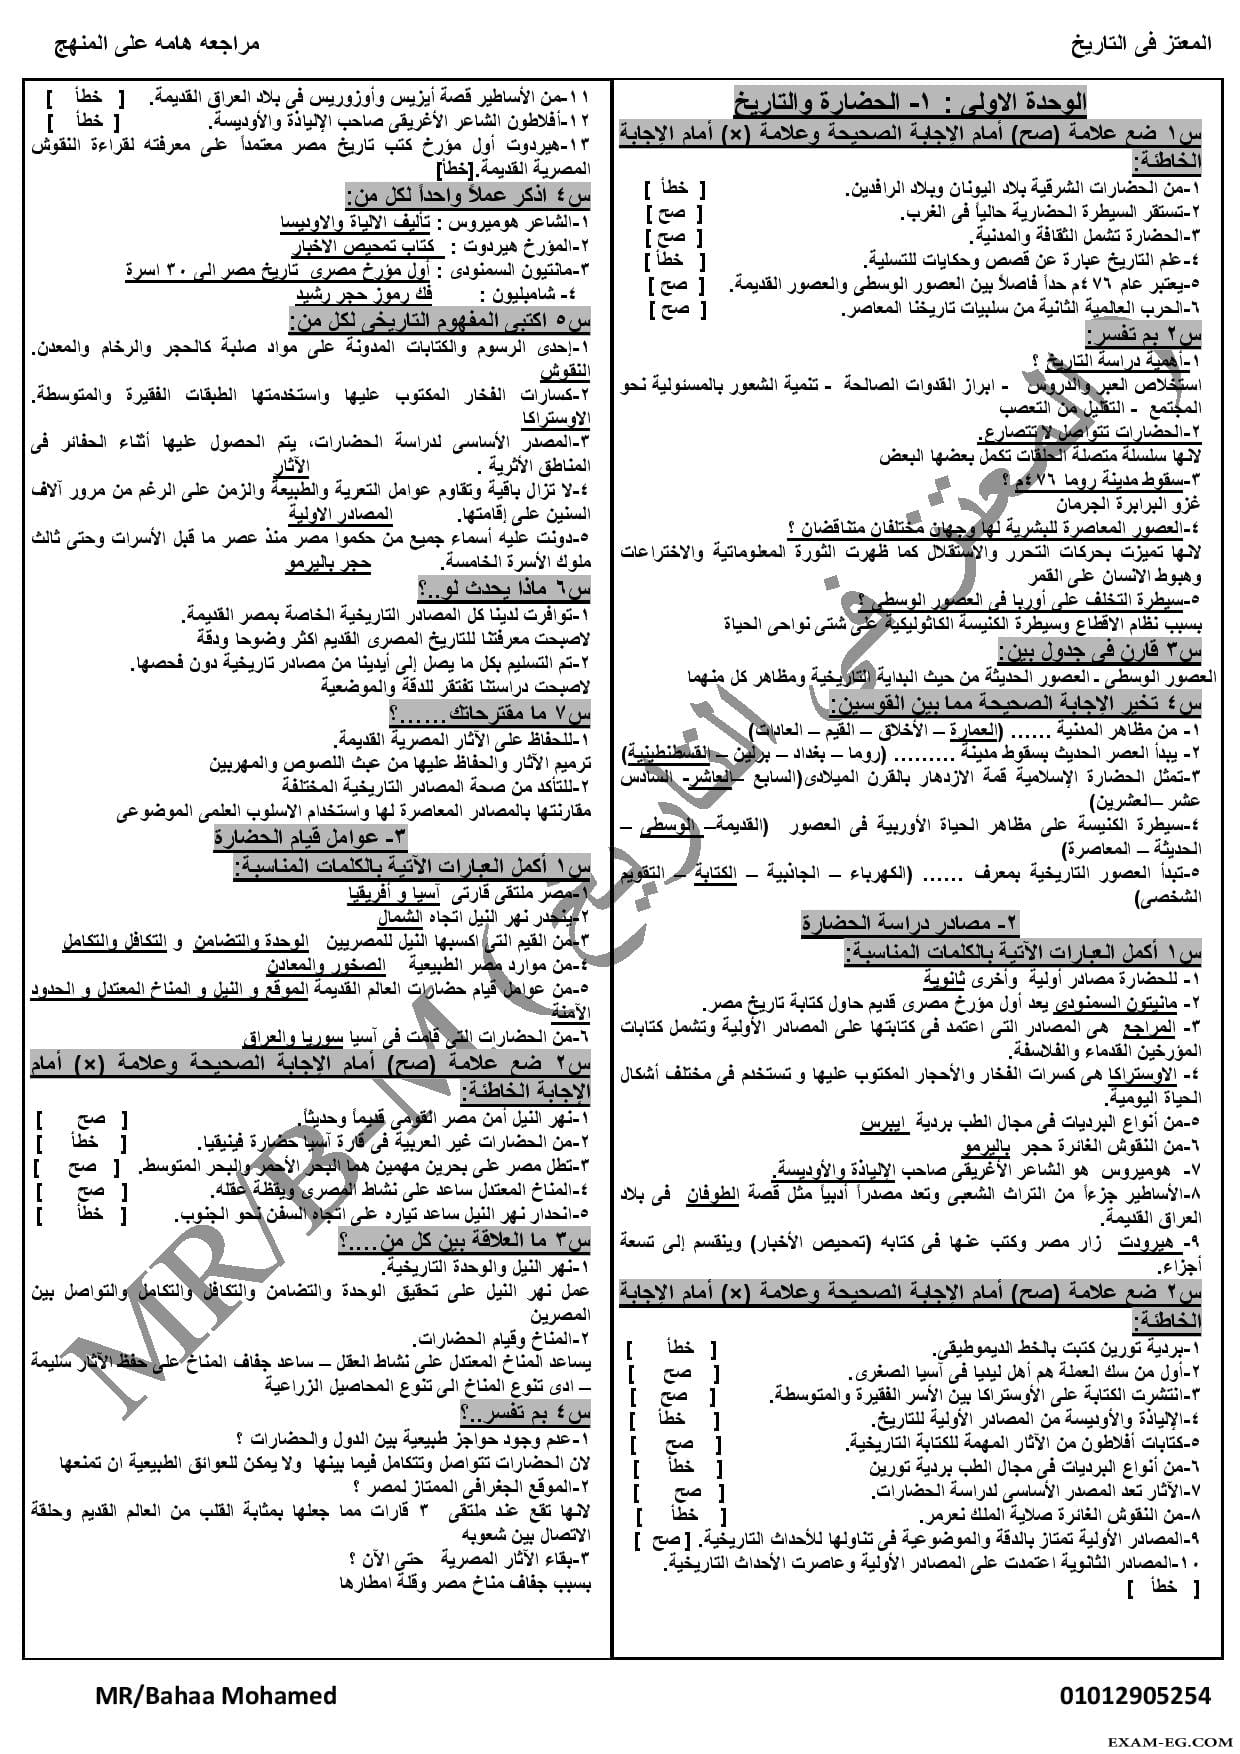 exam-eg.com_15159771718181.jpg